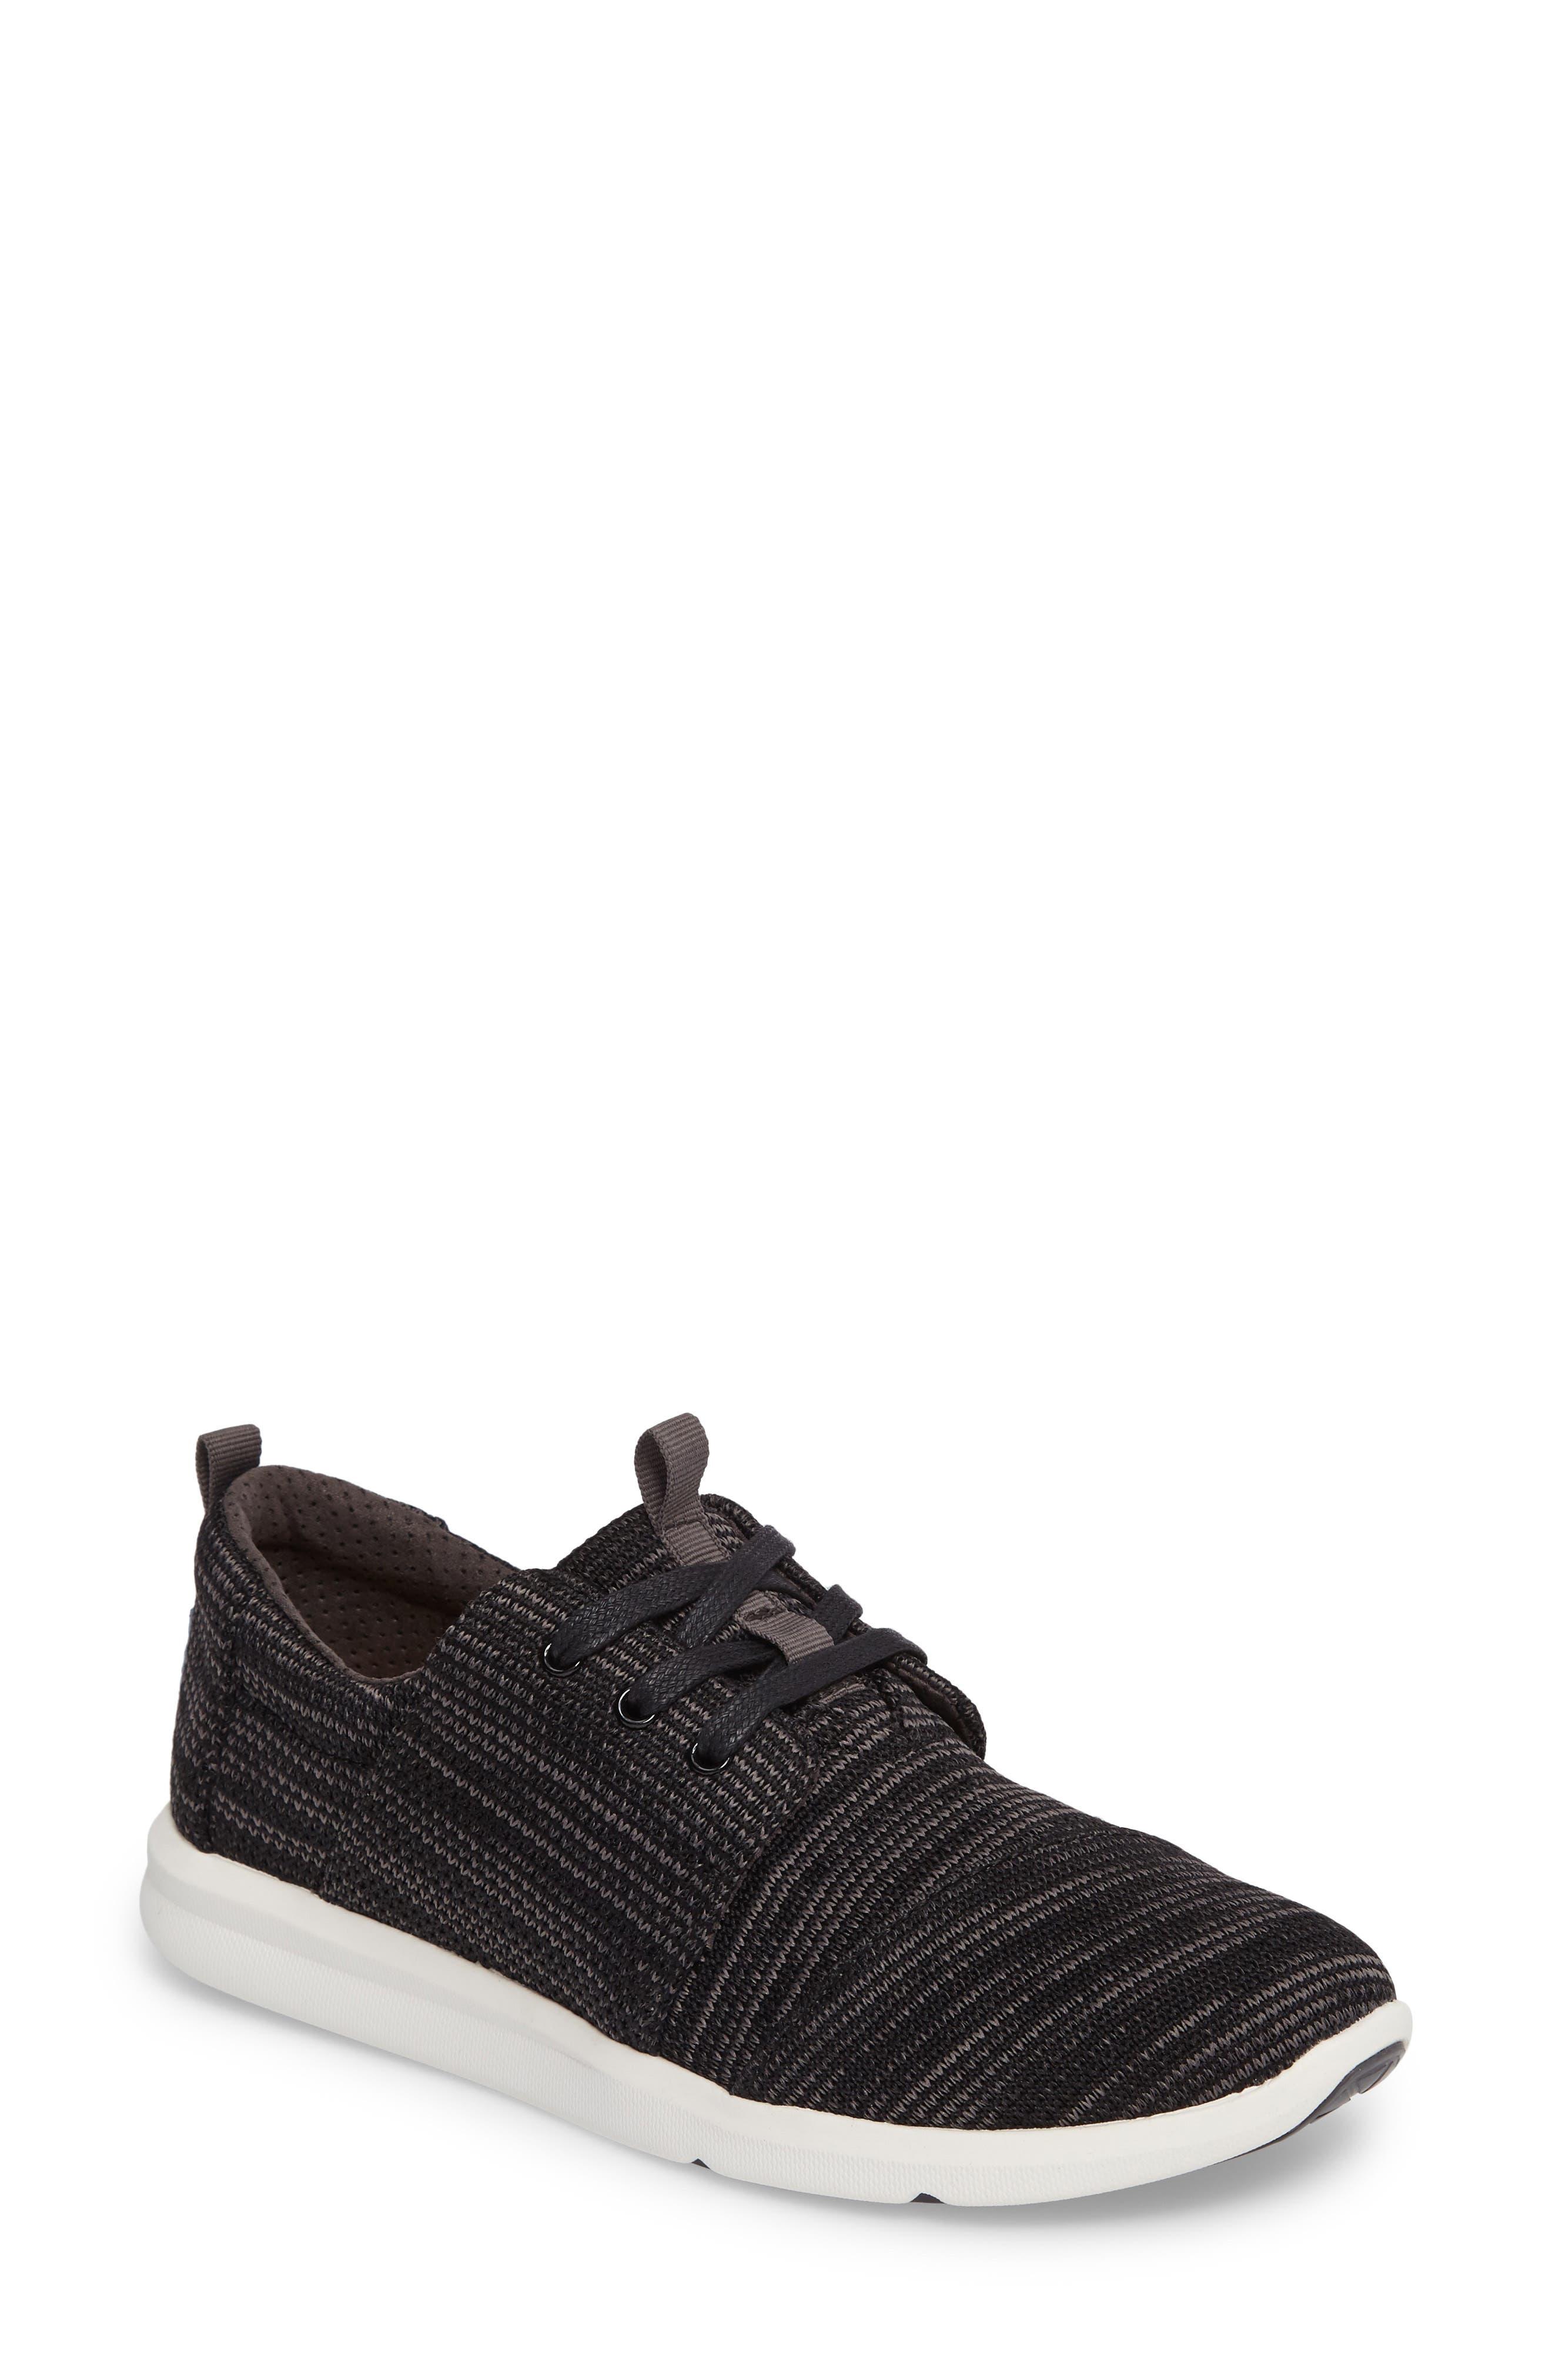 TOMS 'Del Ray' Sneaker, Main, color, 001